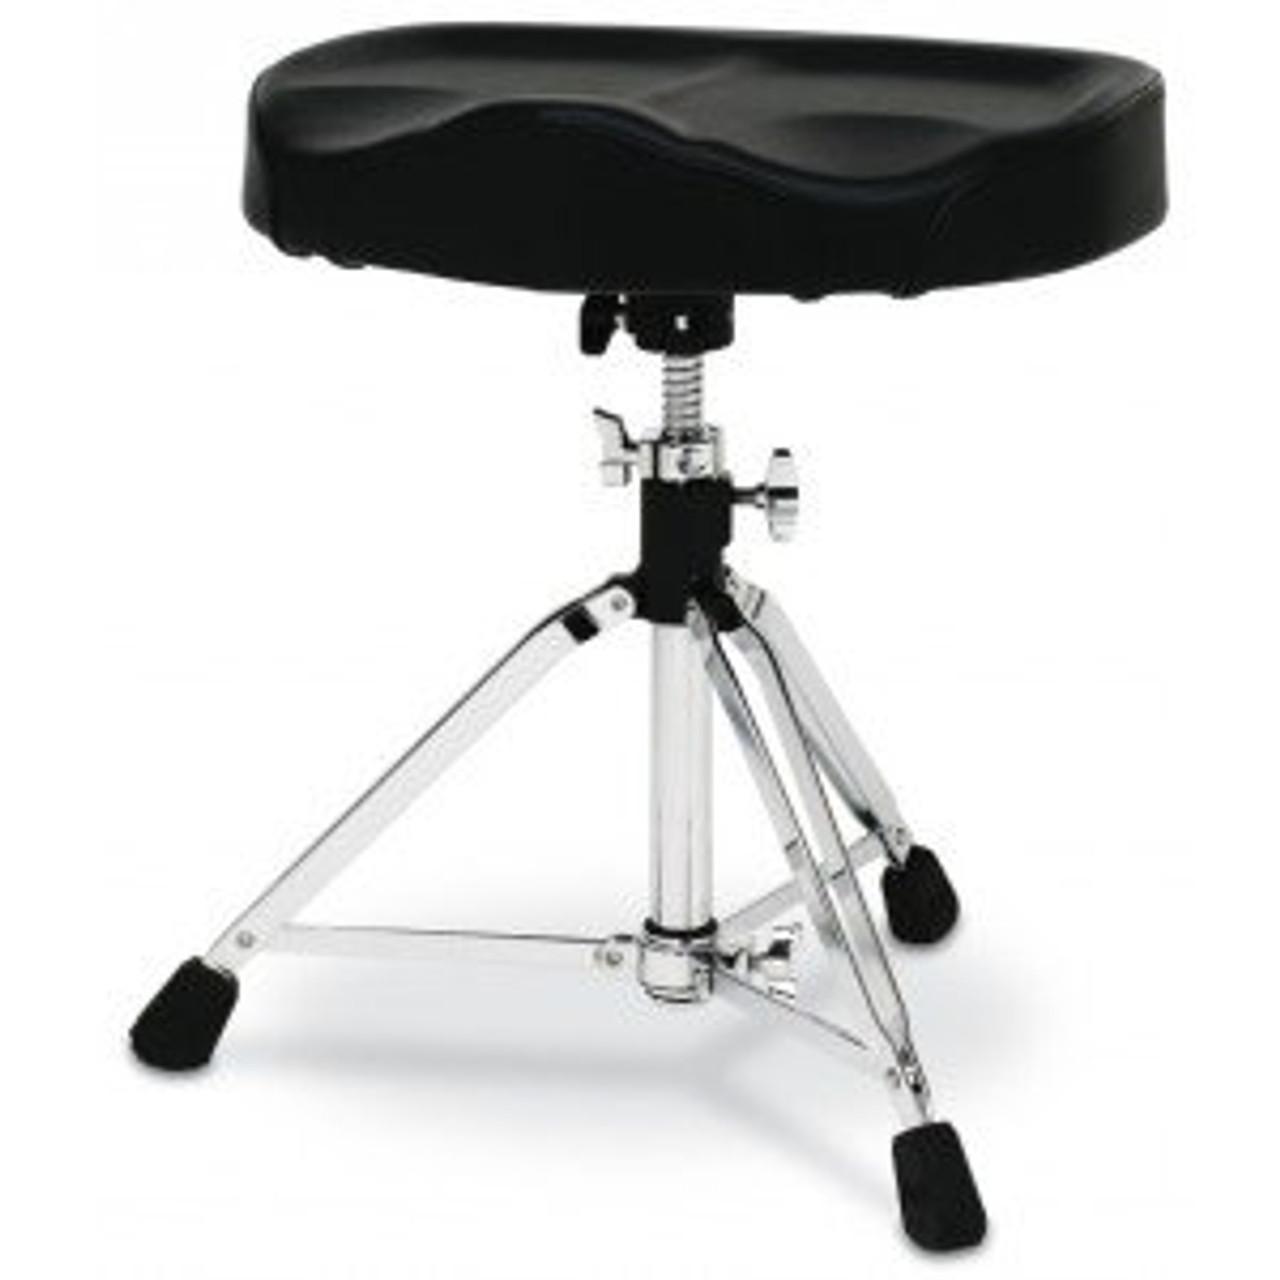 Drum Workshop Hvy Duty Dw Throne W/motorcycle Seat Top